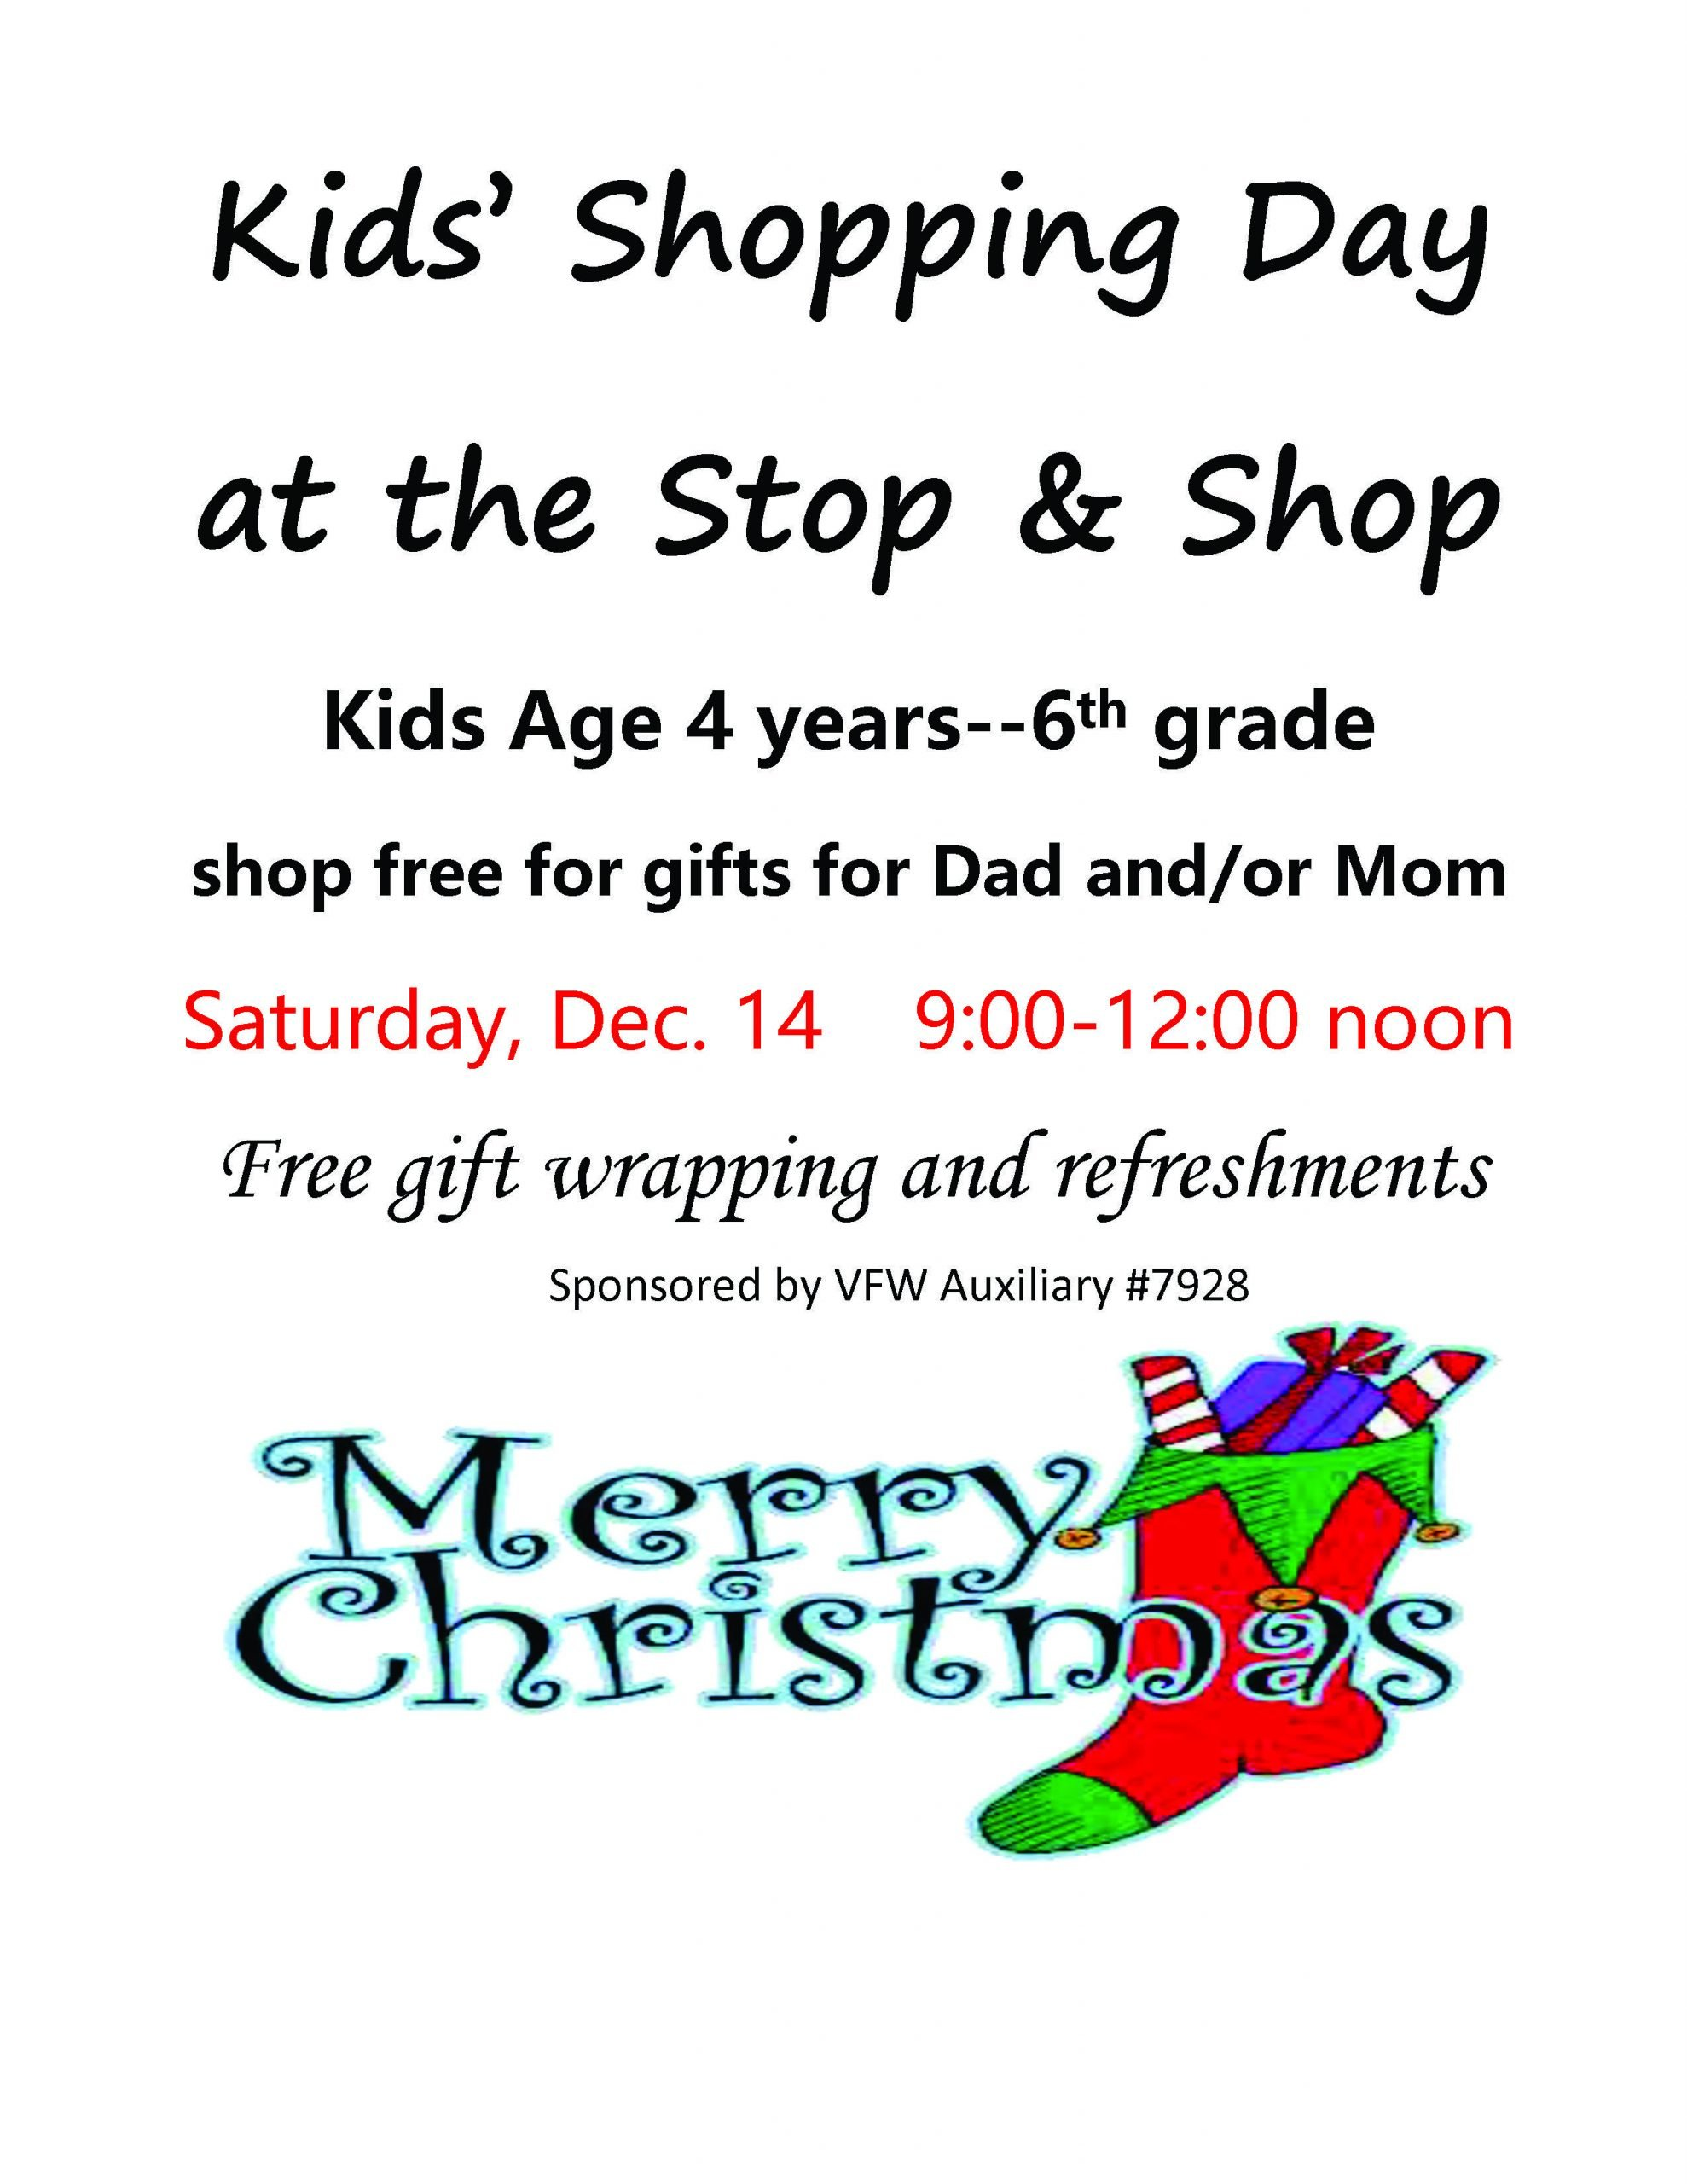 Kids Shopping Day December 14, 2019